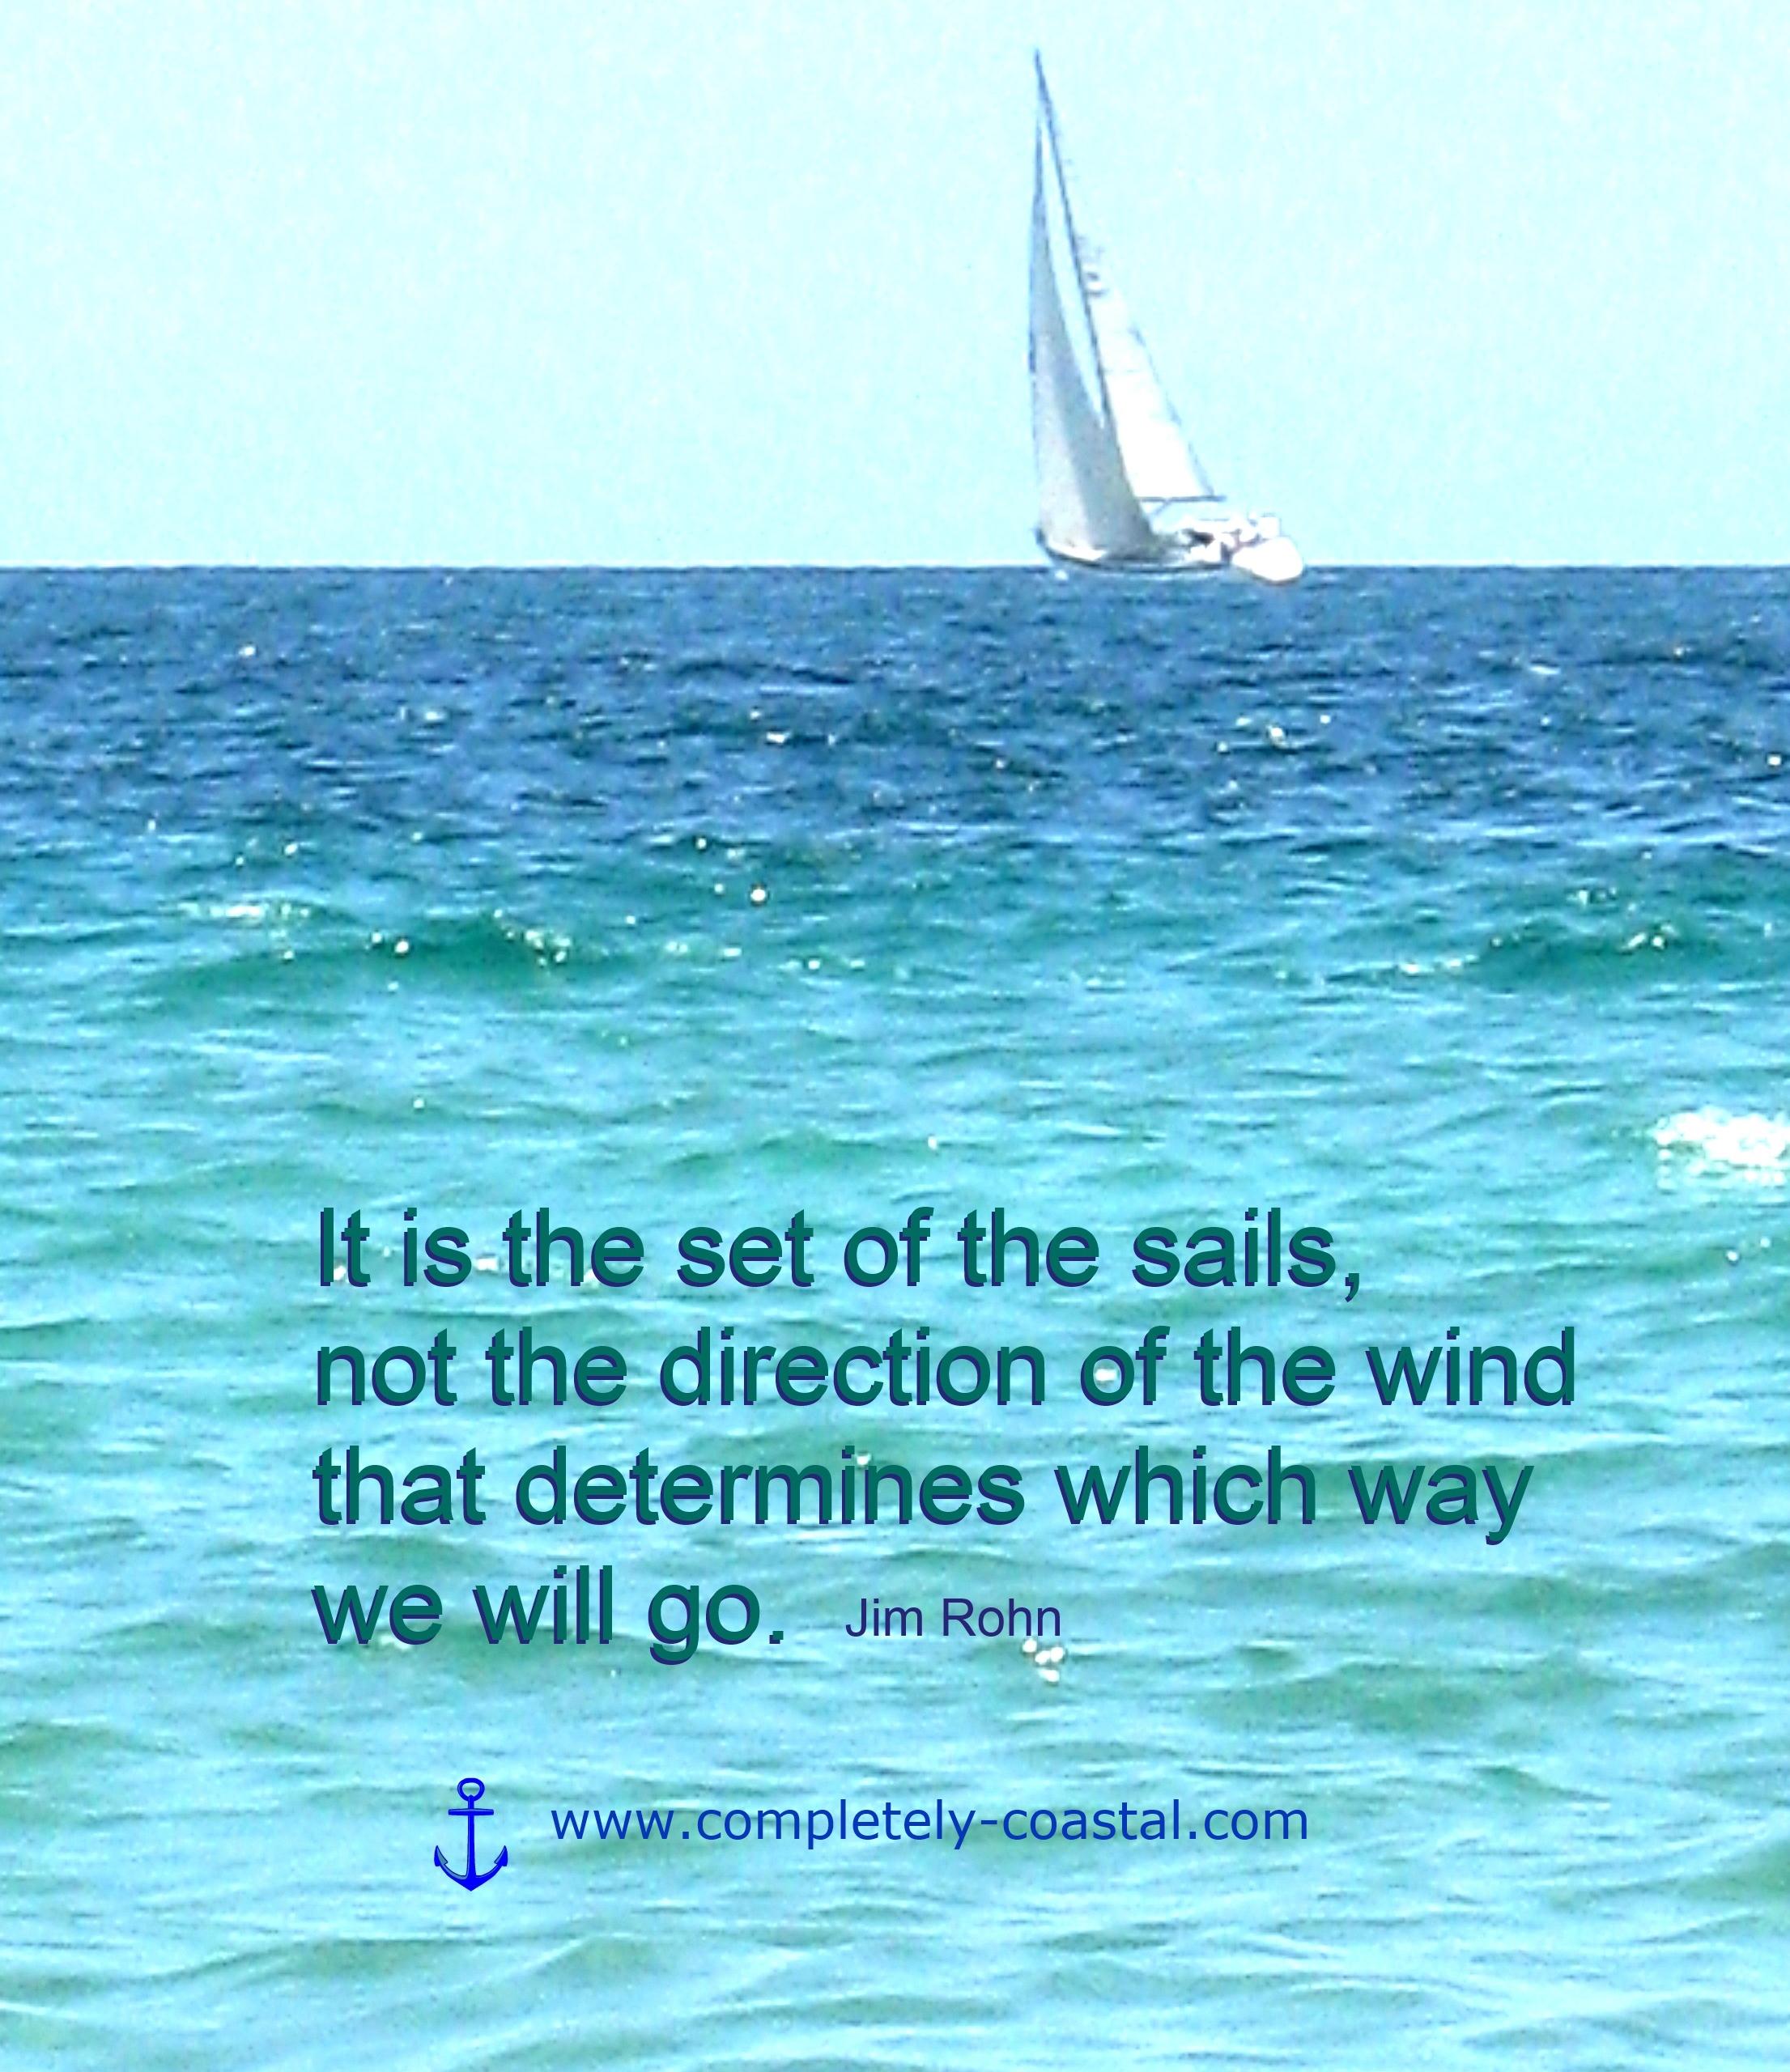 Inspirational Quotes Sailing: Sailing Quotes About Life. QuotesGram